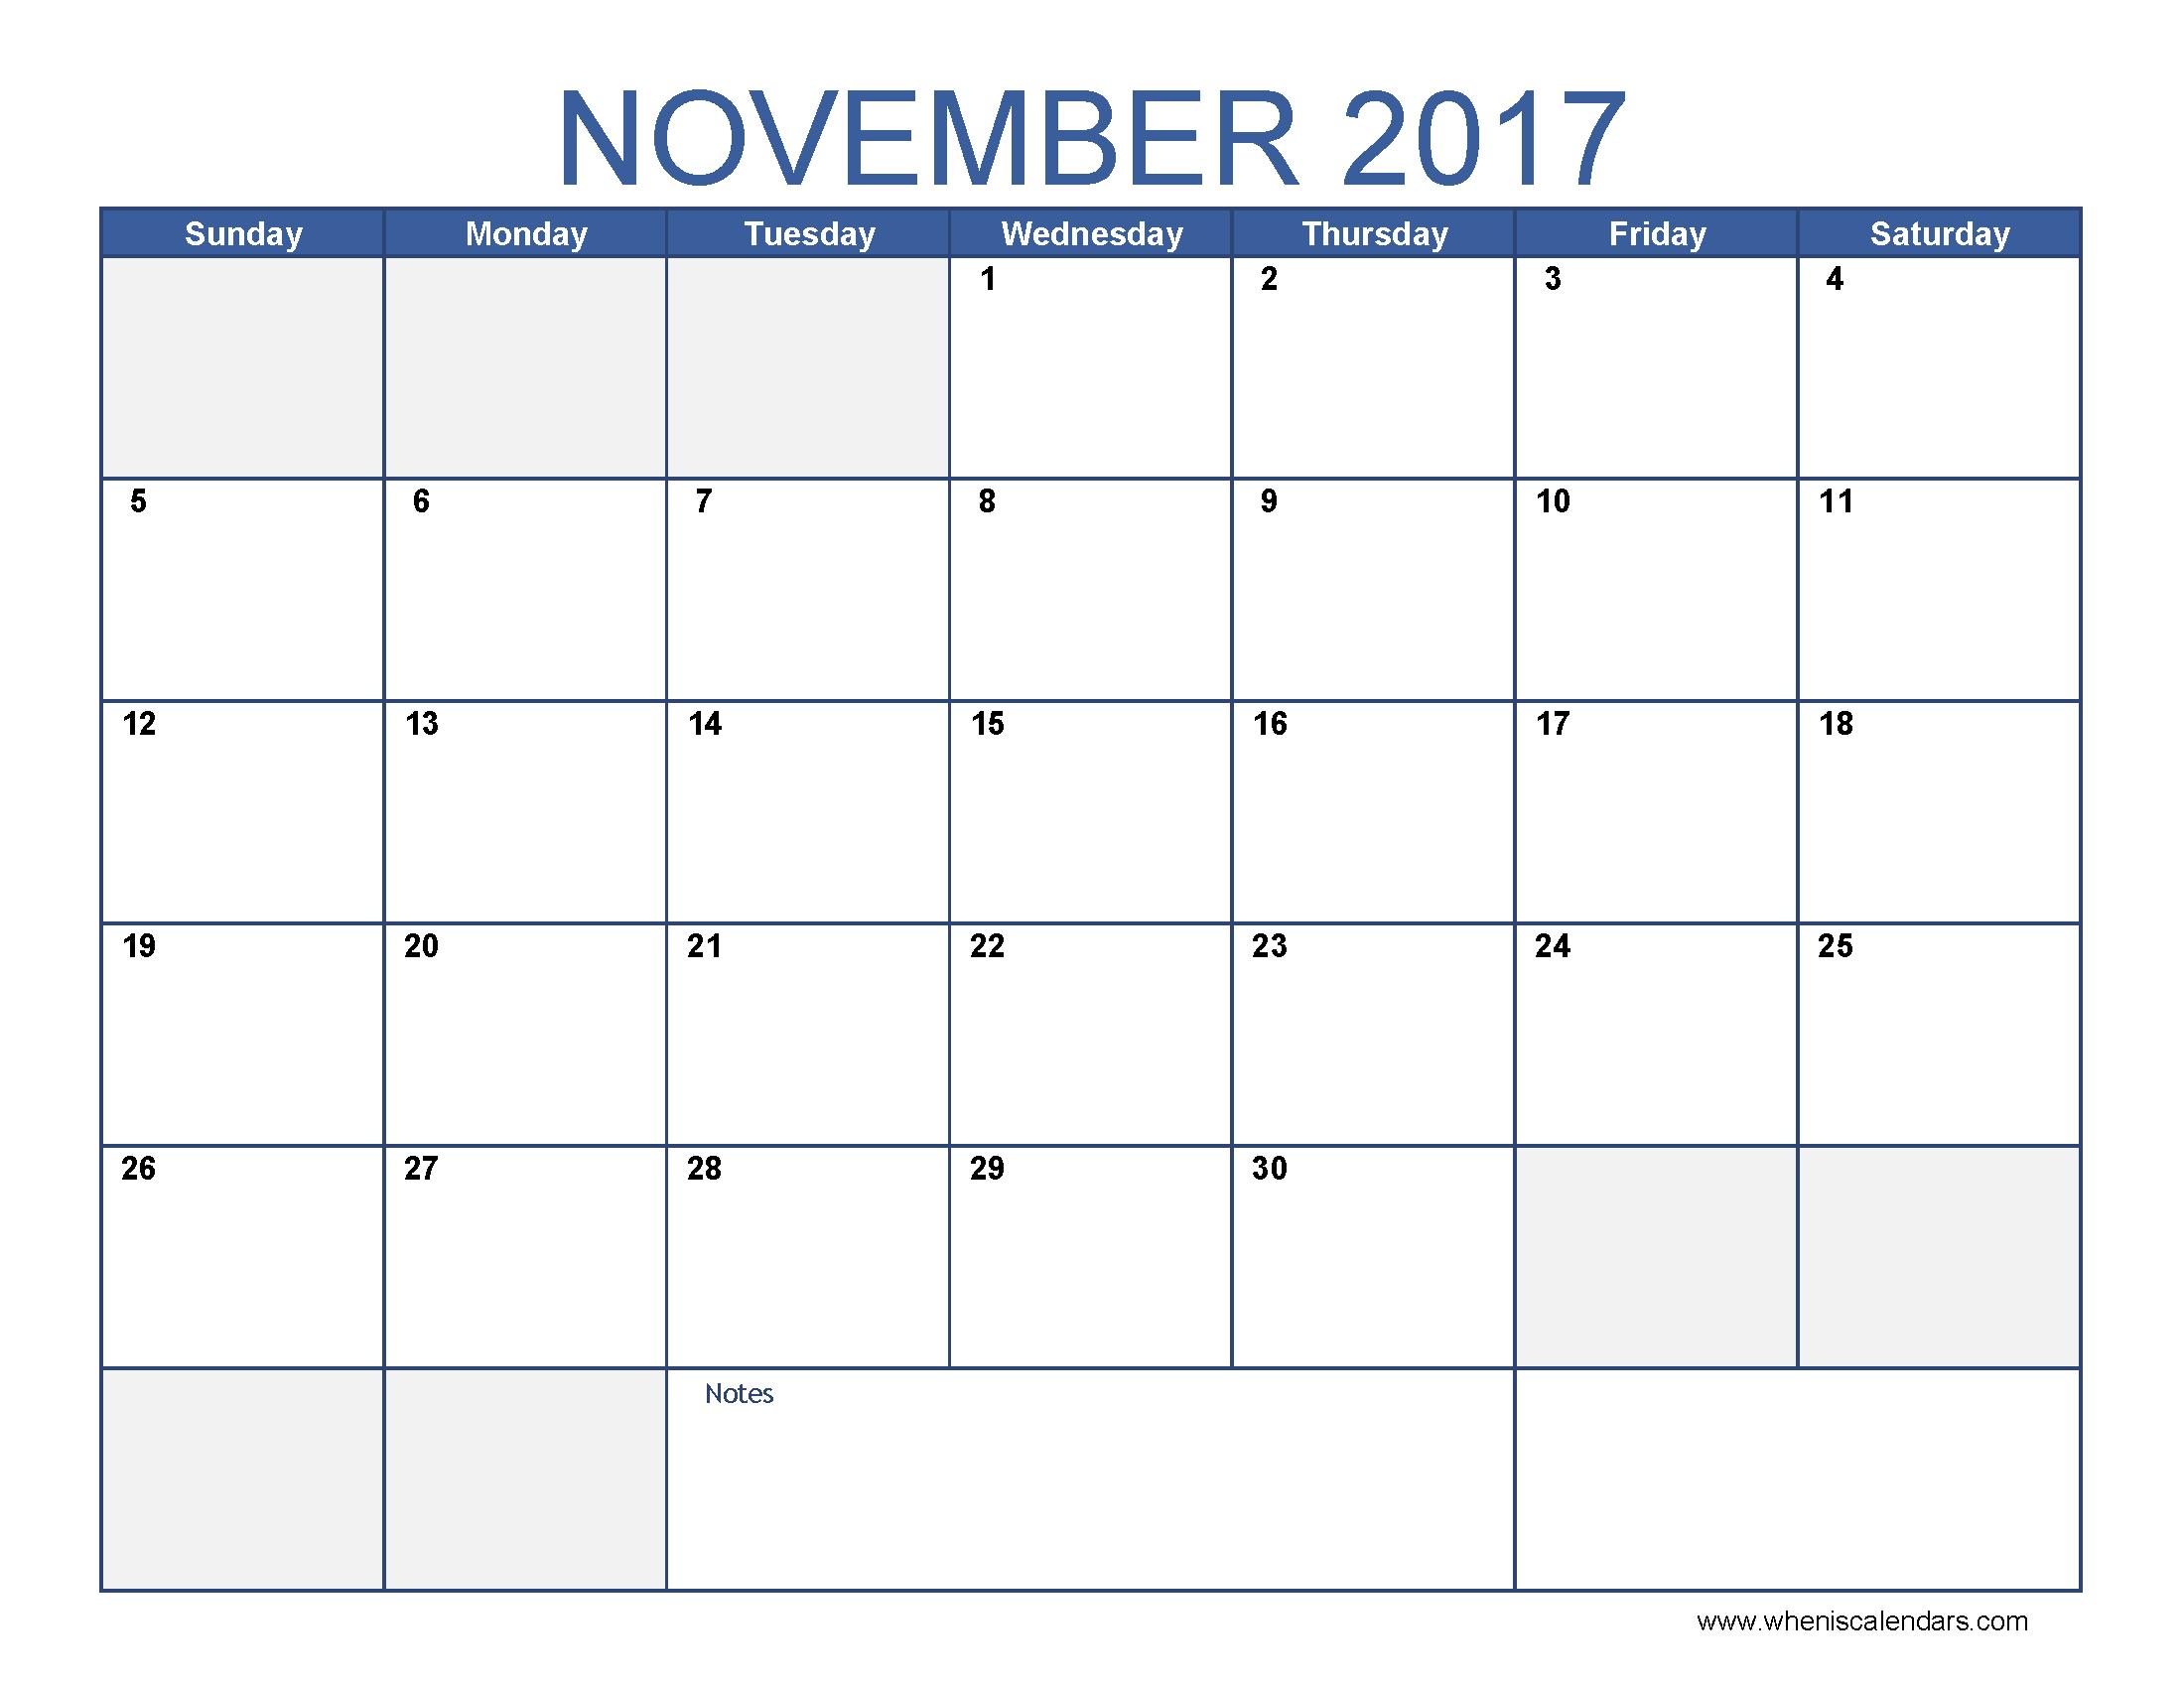 November 2017 Calendar Template | free calendar 2017